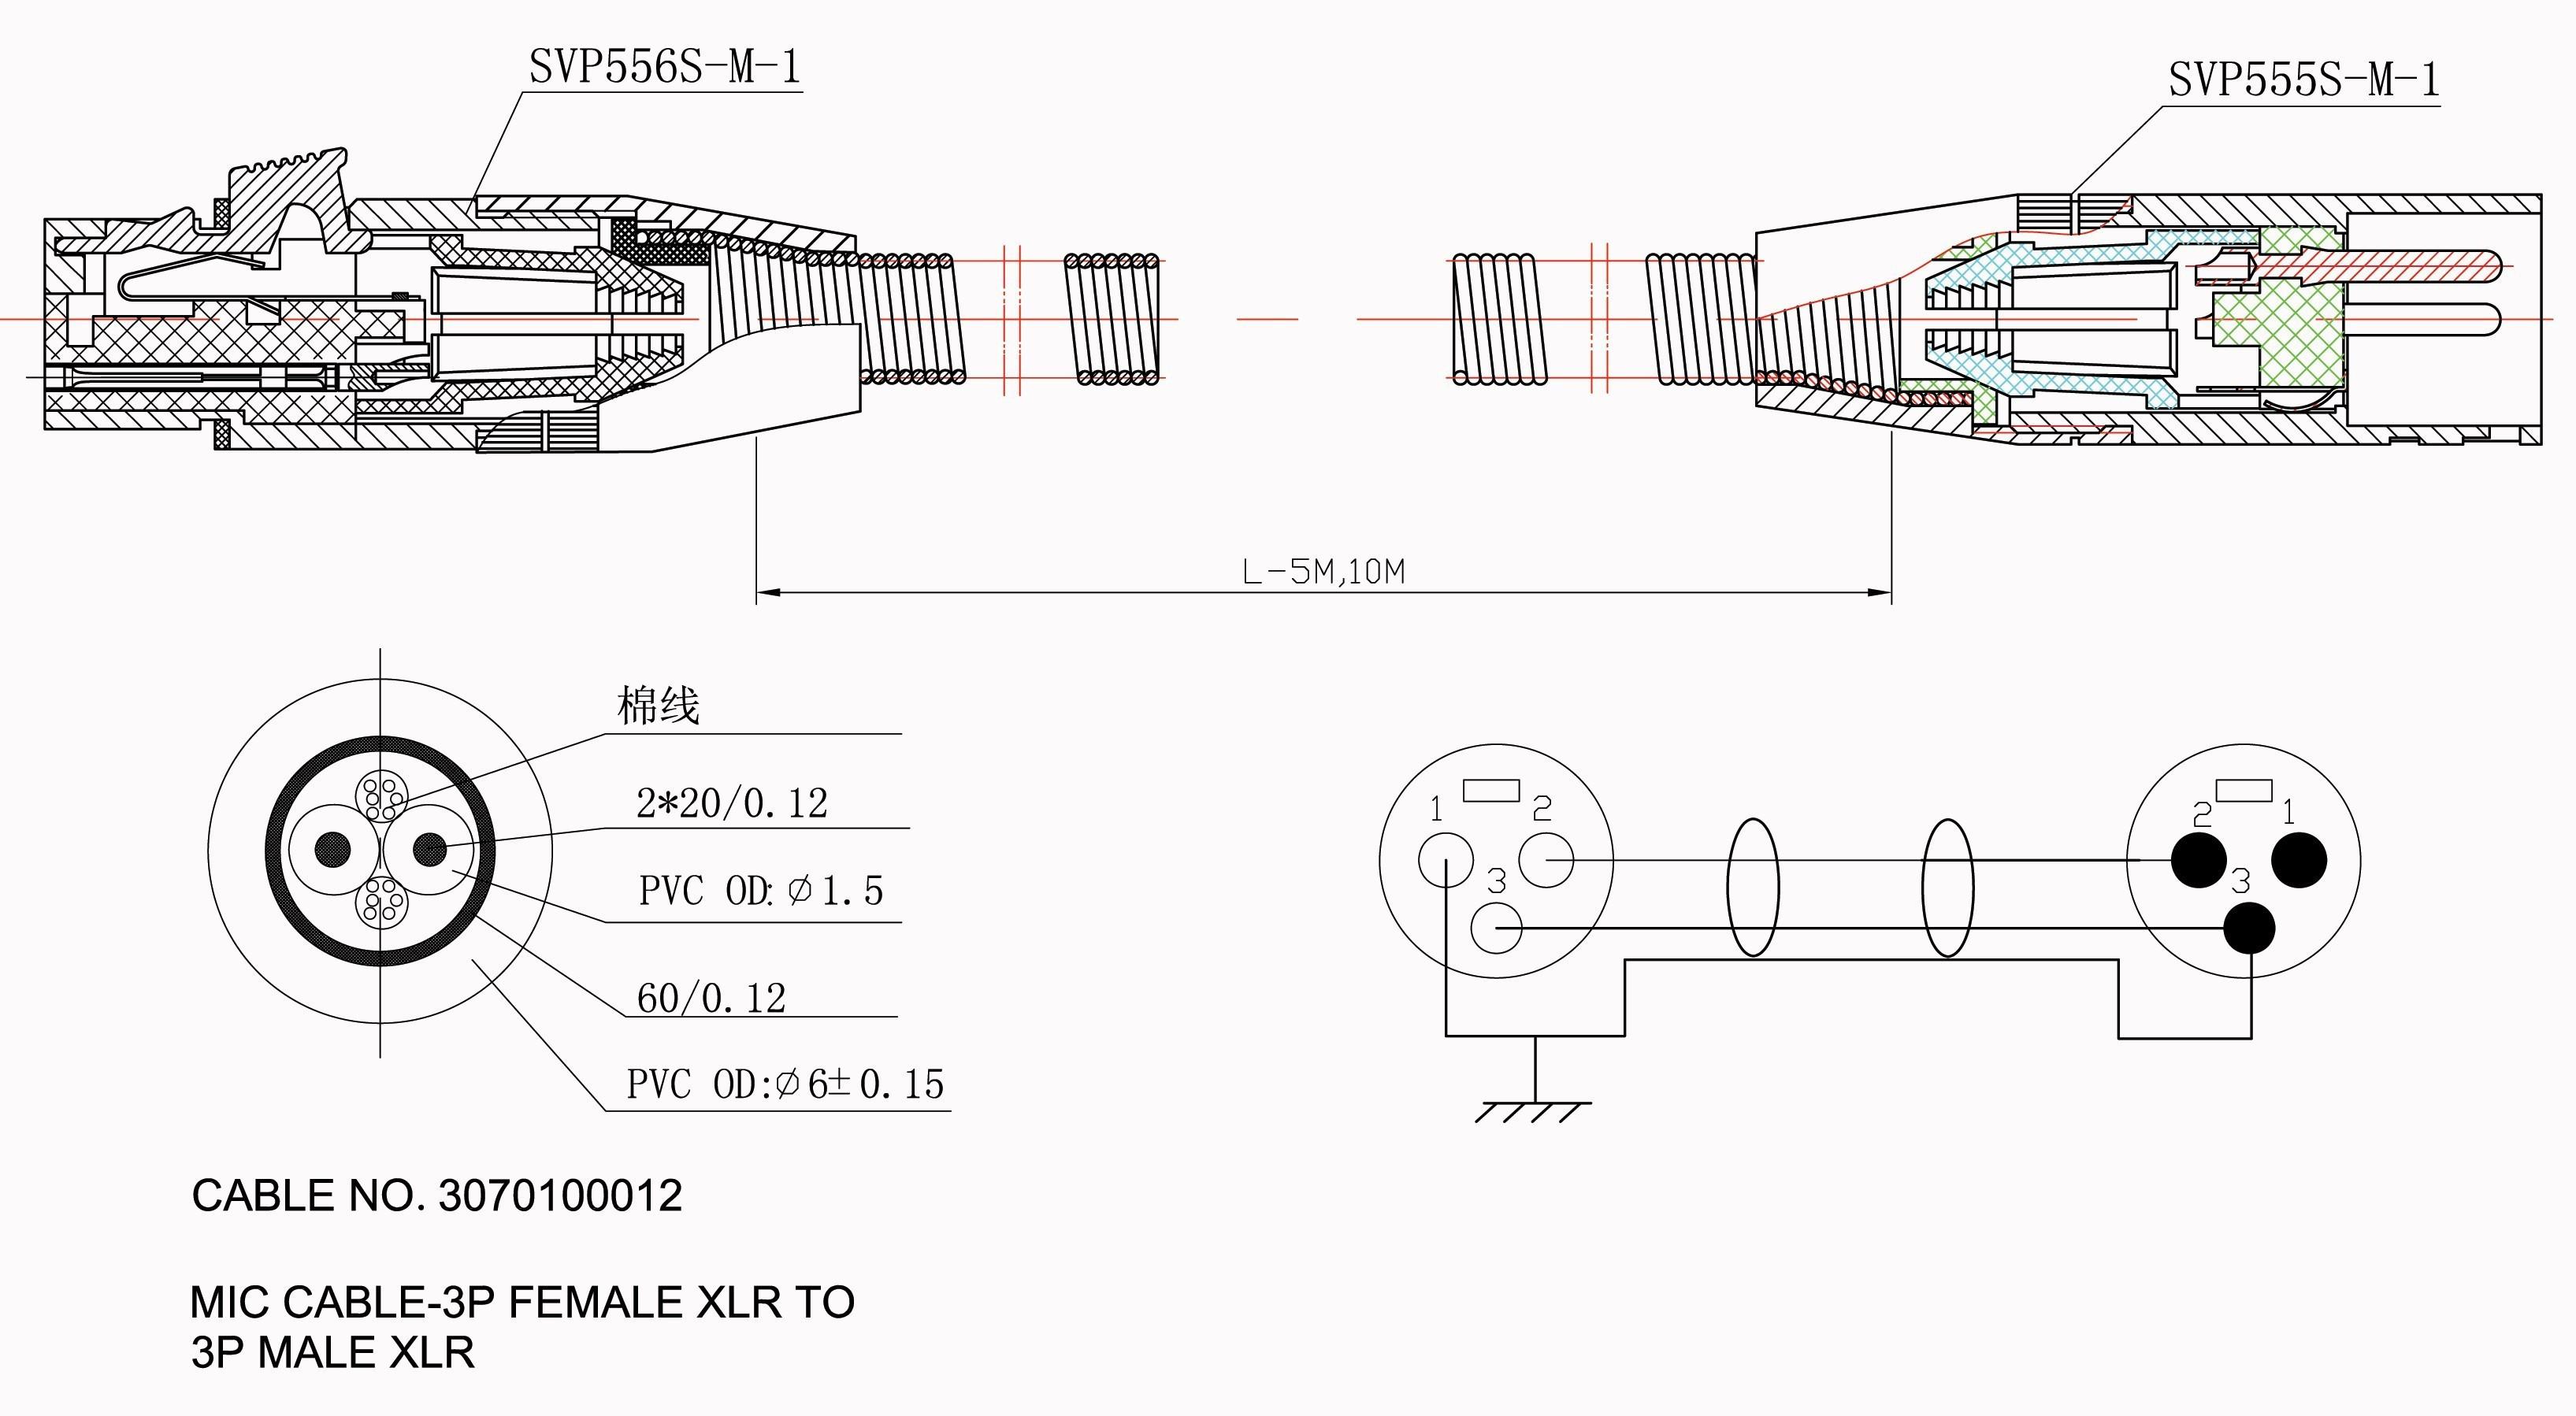 Diy solar Panel Wiring Diagram solar Panel Wiring Garden solar Light Wire Diagram Dhads Of Diy solar Panel Wiring Diagram